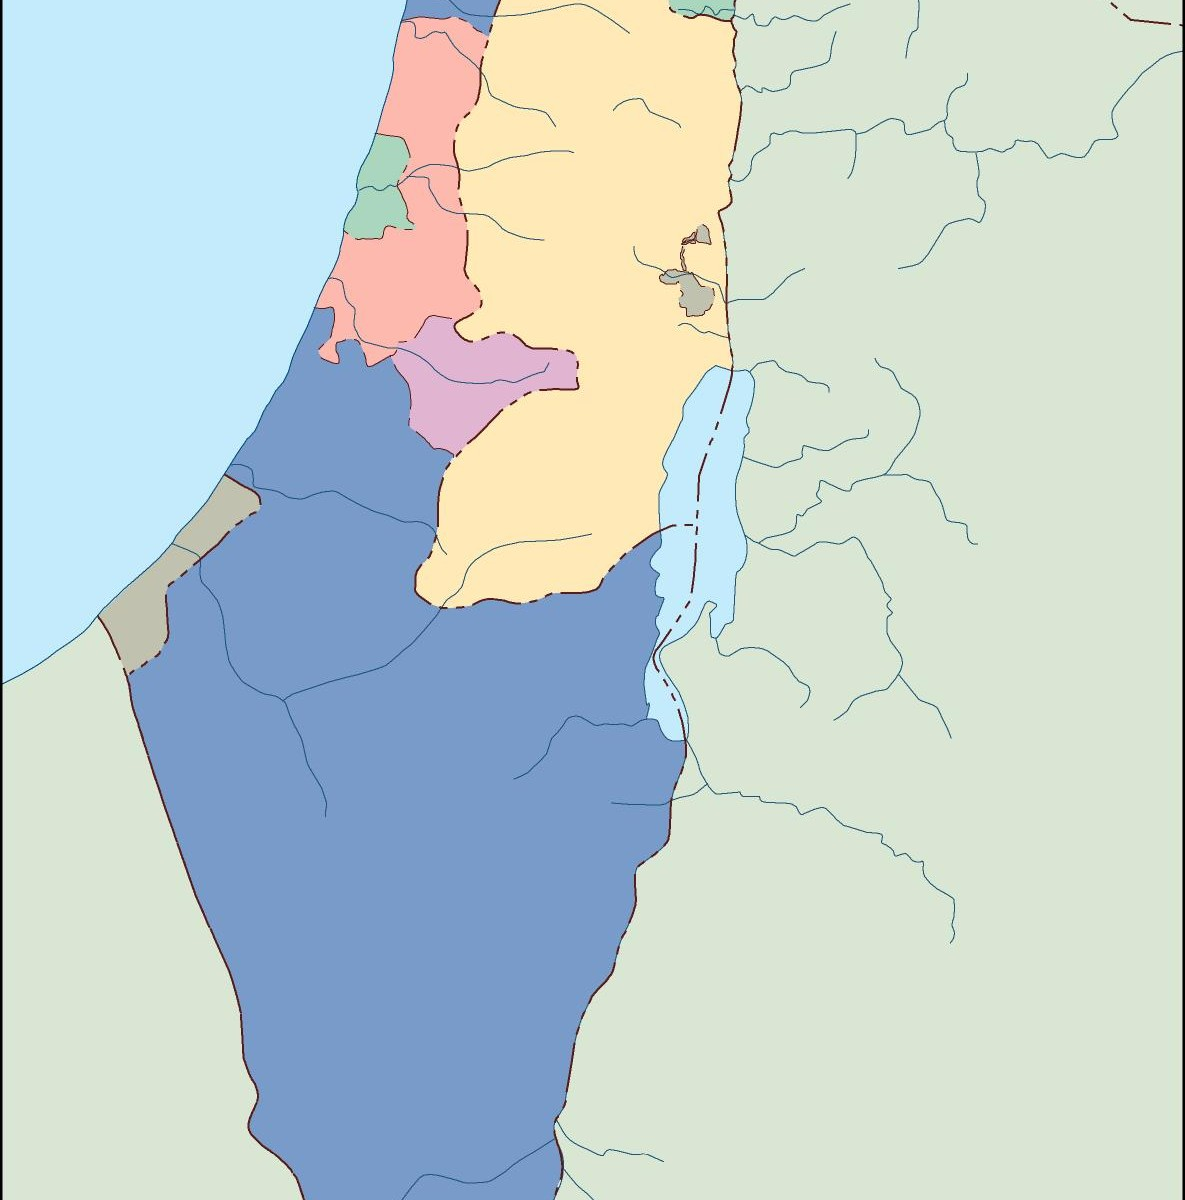 Israel blind map eps illustrator map a vector eps maps designed israel blind map gumiabroncs Gallery